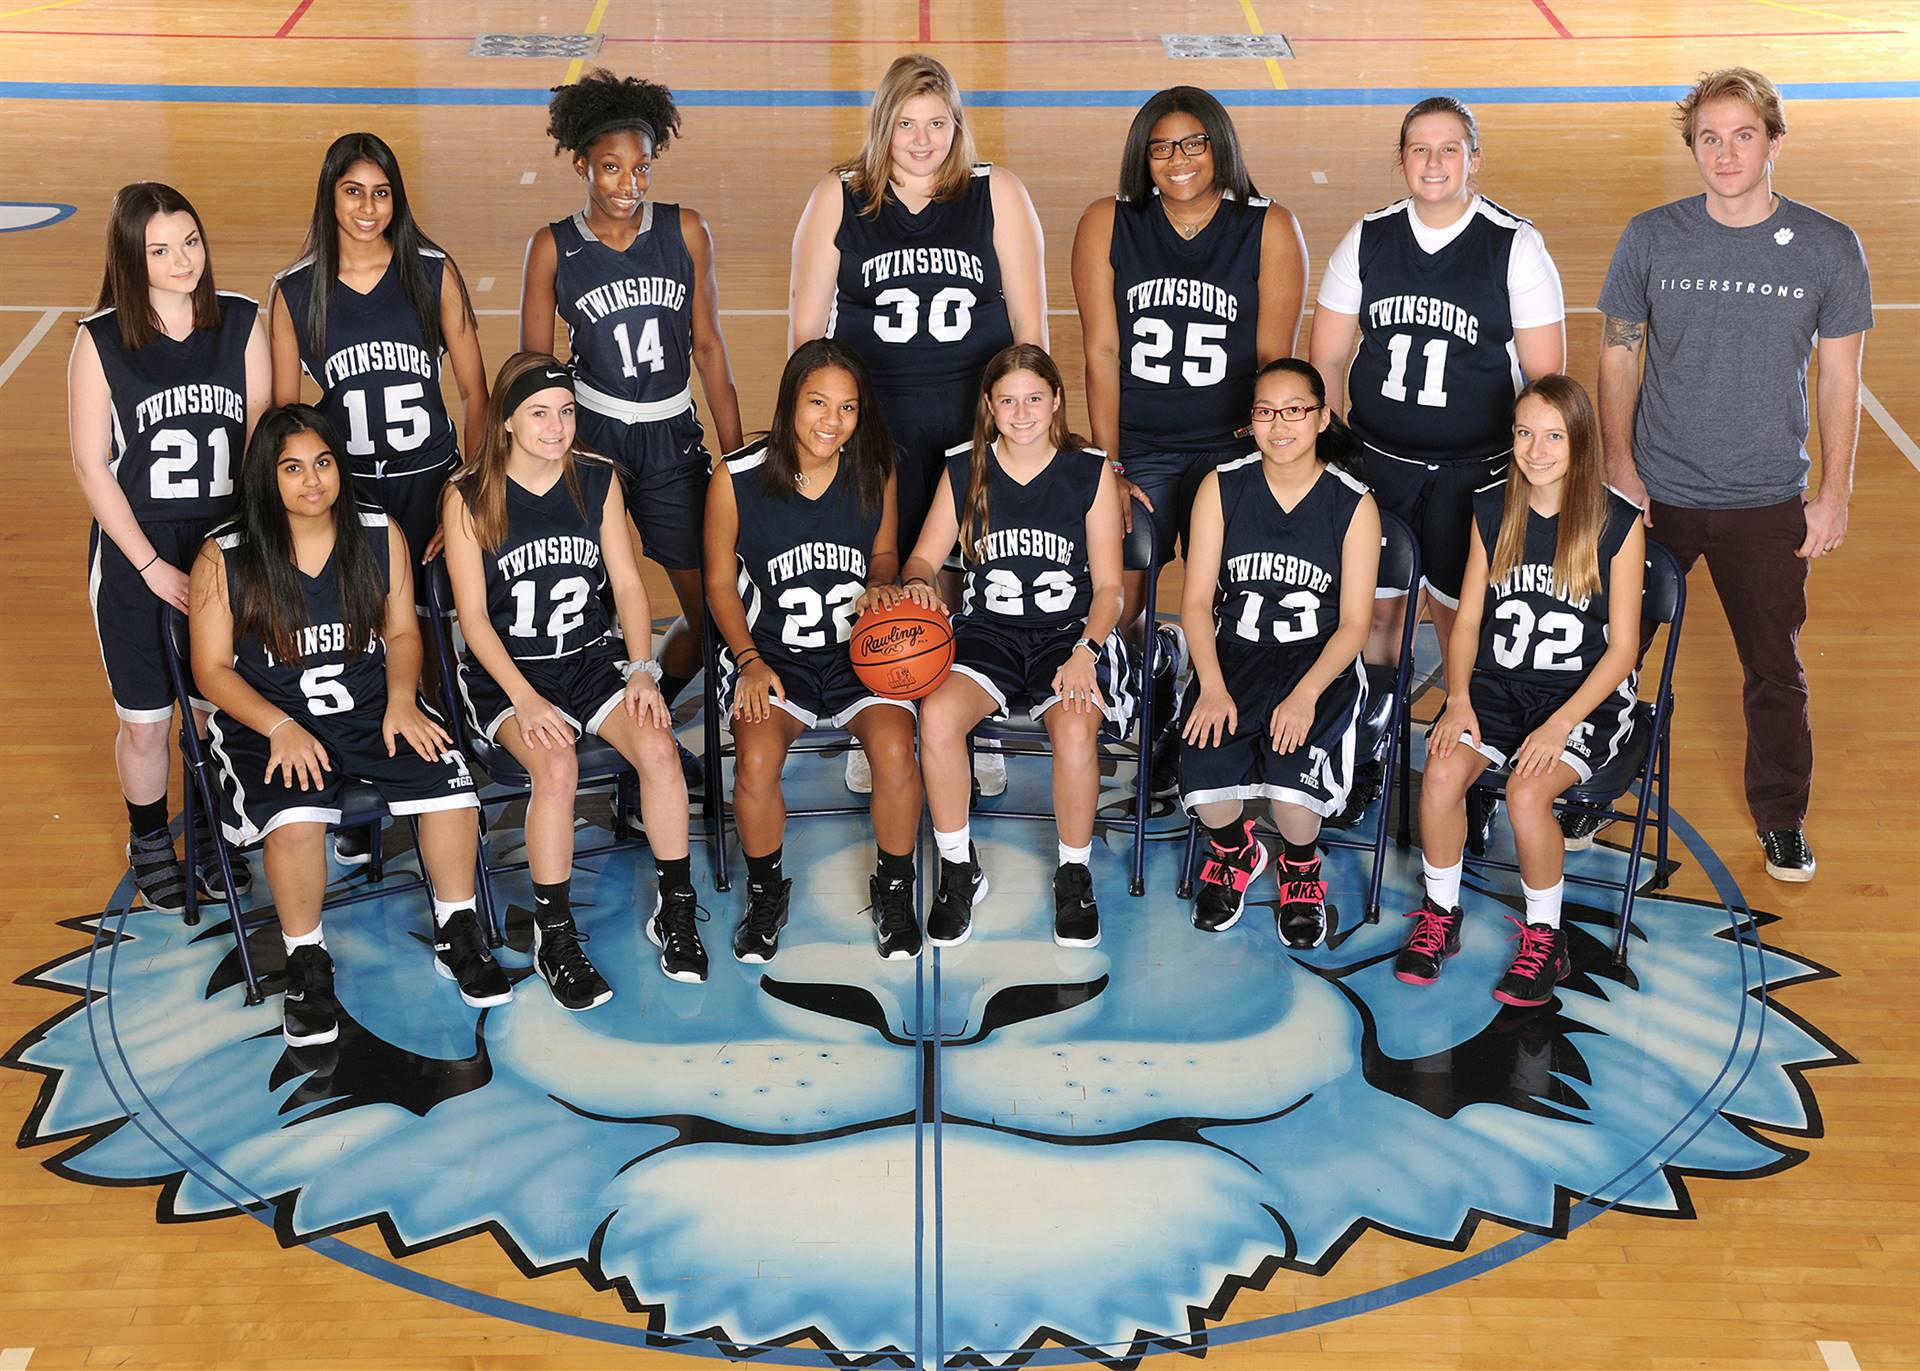 18-19 JV Team Photo